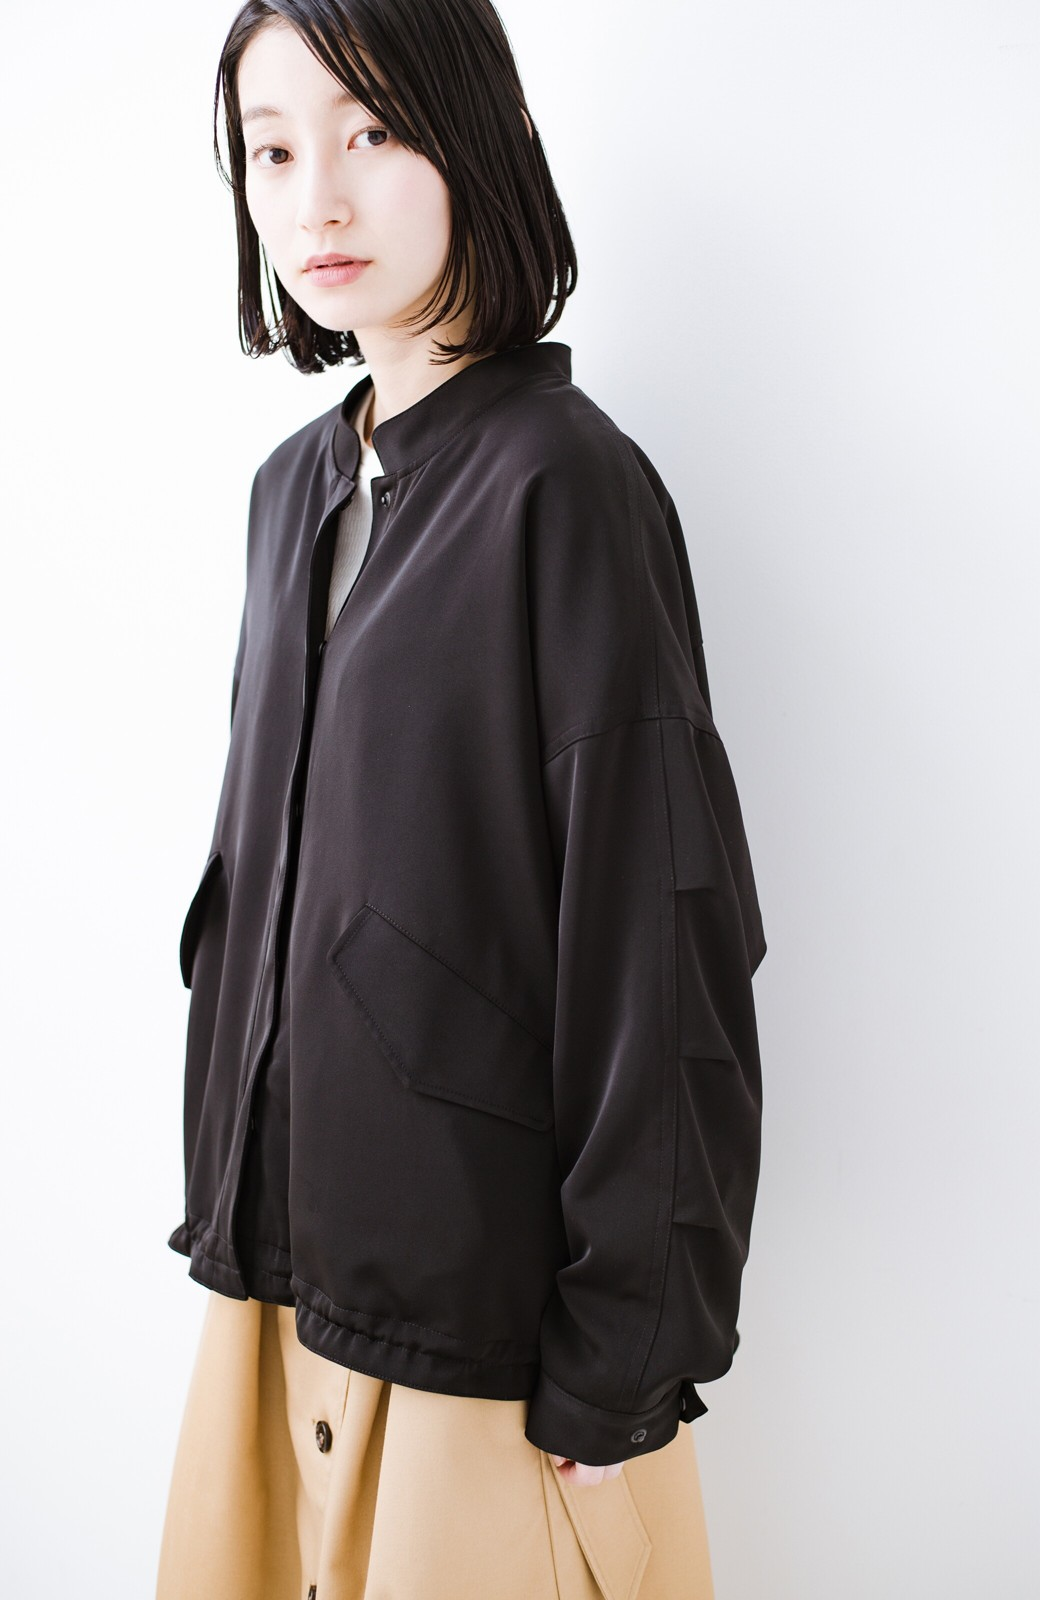 haco! 気軽に羽織ってかっこよくキマるオトナっぽブルゾンbyMAKORI <ブラック>の商品写真24